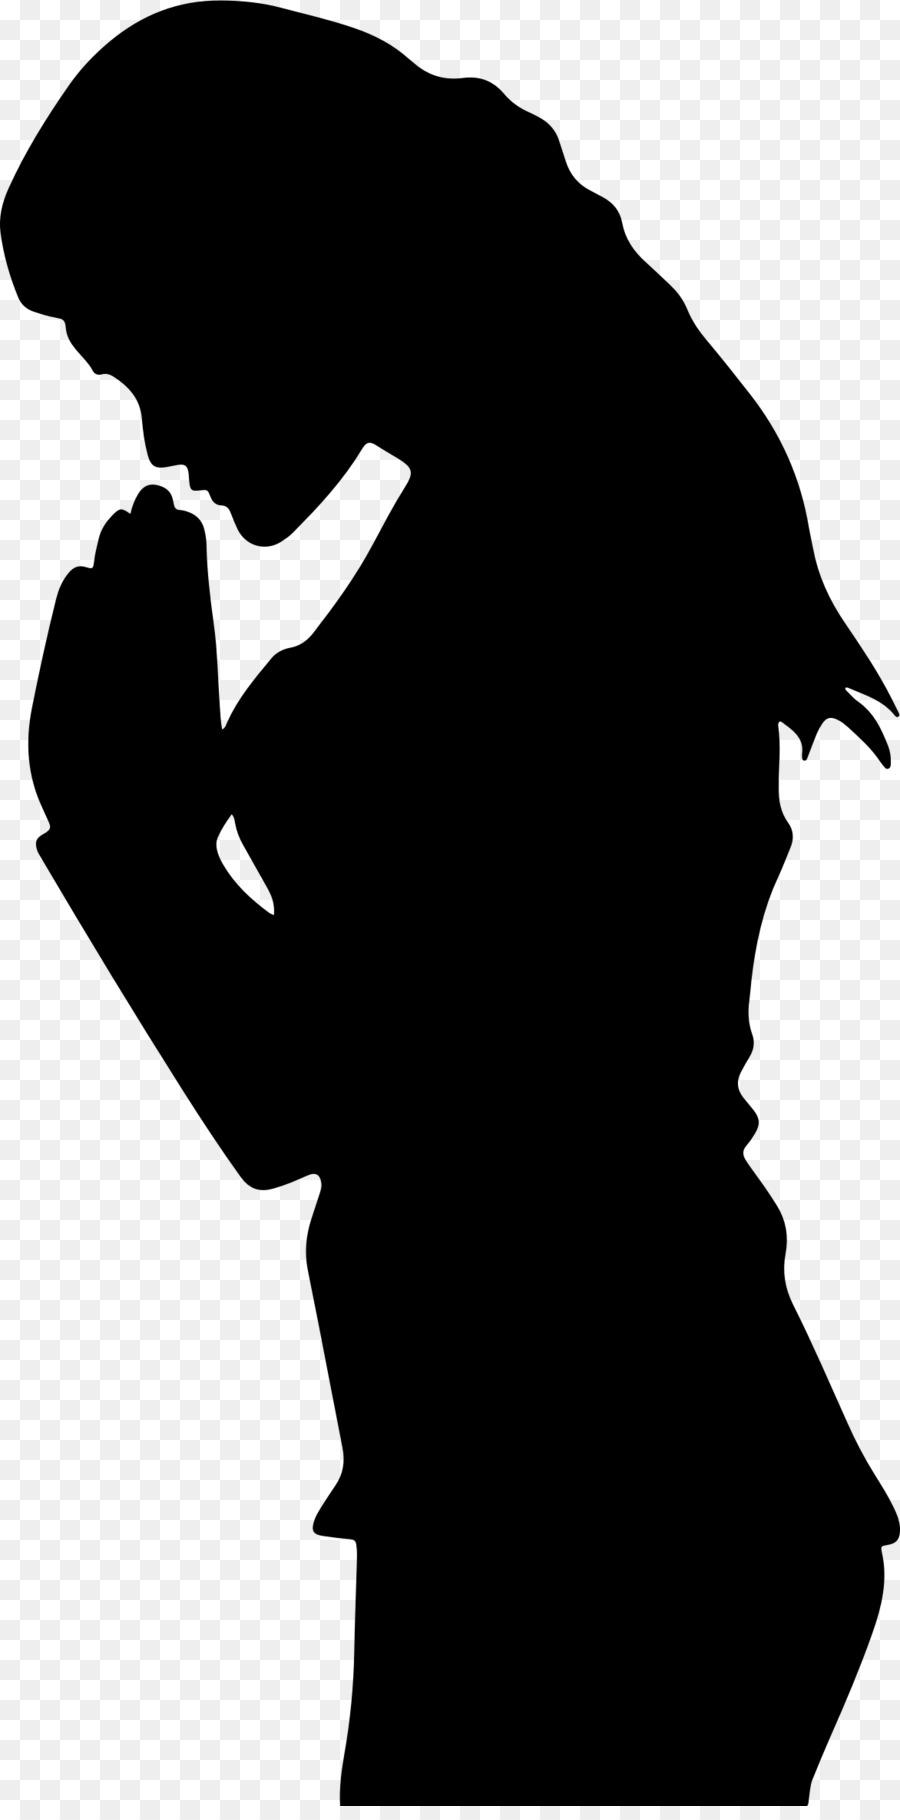 Christian clipart silhouette. Man cartoon illustration black